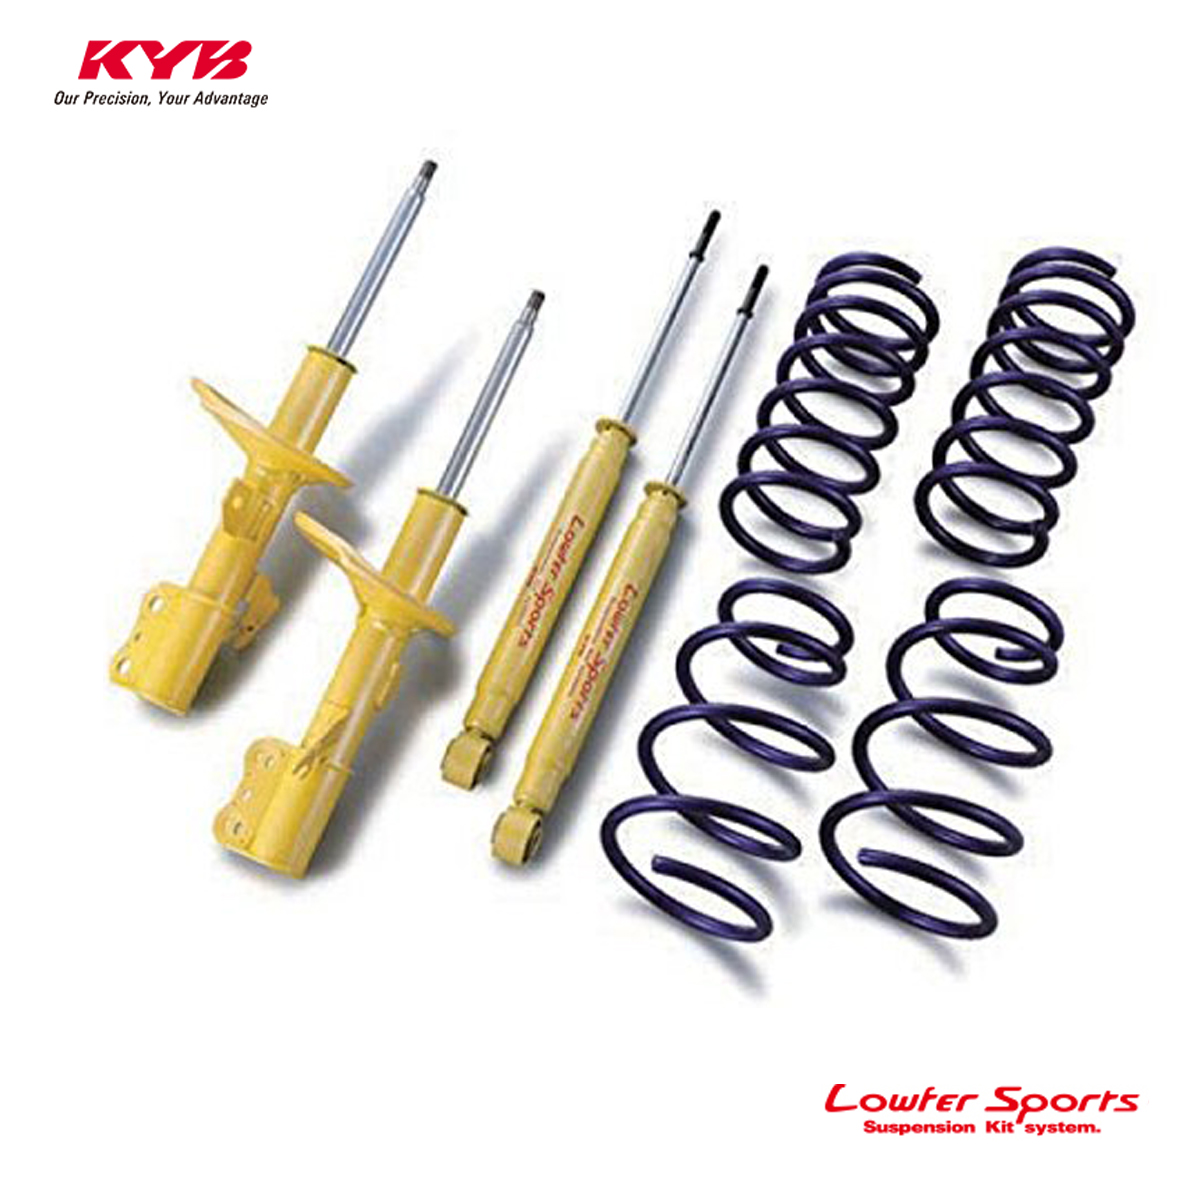 KYB カヤバ アコードワゴン CE1 ショックアブソーバー サスペンションキット Lowfer Sports LKIT-CE1 配送先条件有り